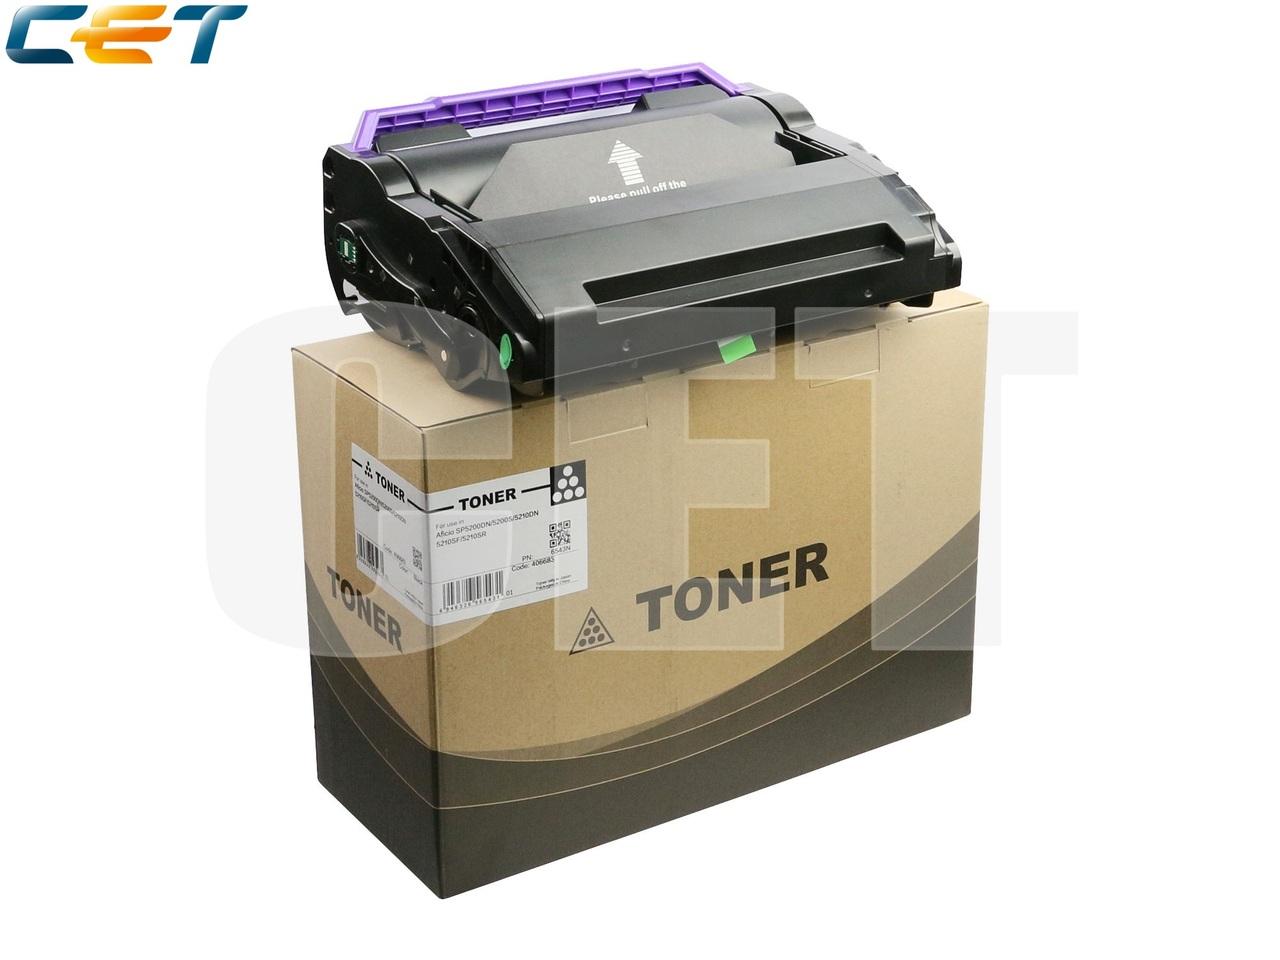 Тонер-картридж 406685, 821229 для RICOH AficioSP5200DN/SP5210DN (CET), (WW), 25000 стр., CET6543N